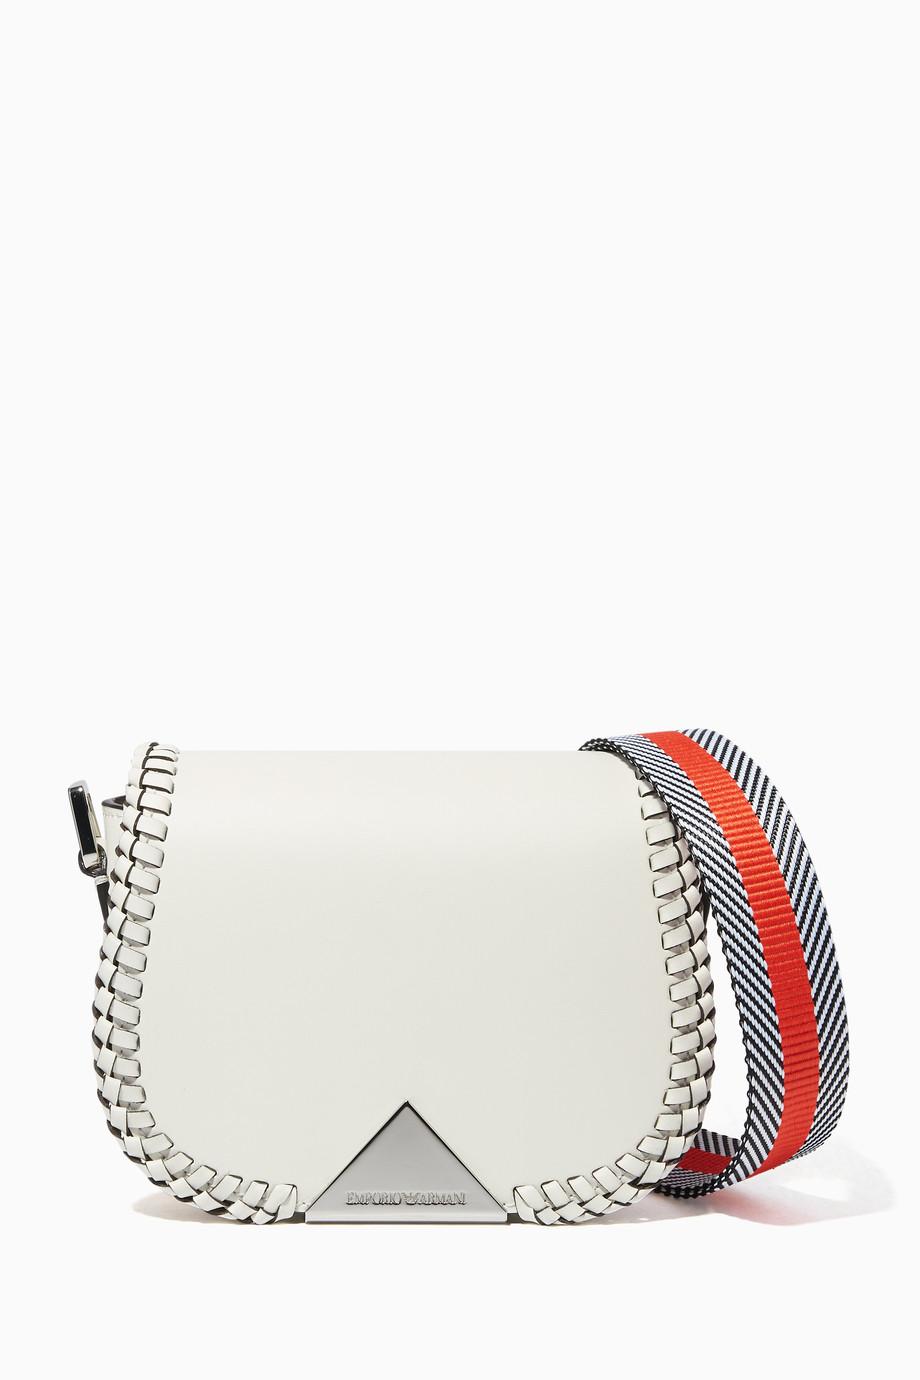 b83993c95c Shop Emporio Armani White Peggy Embroidered Cross Body Bag for Women ...